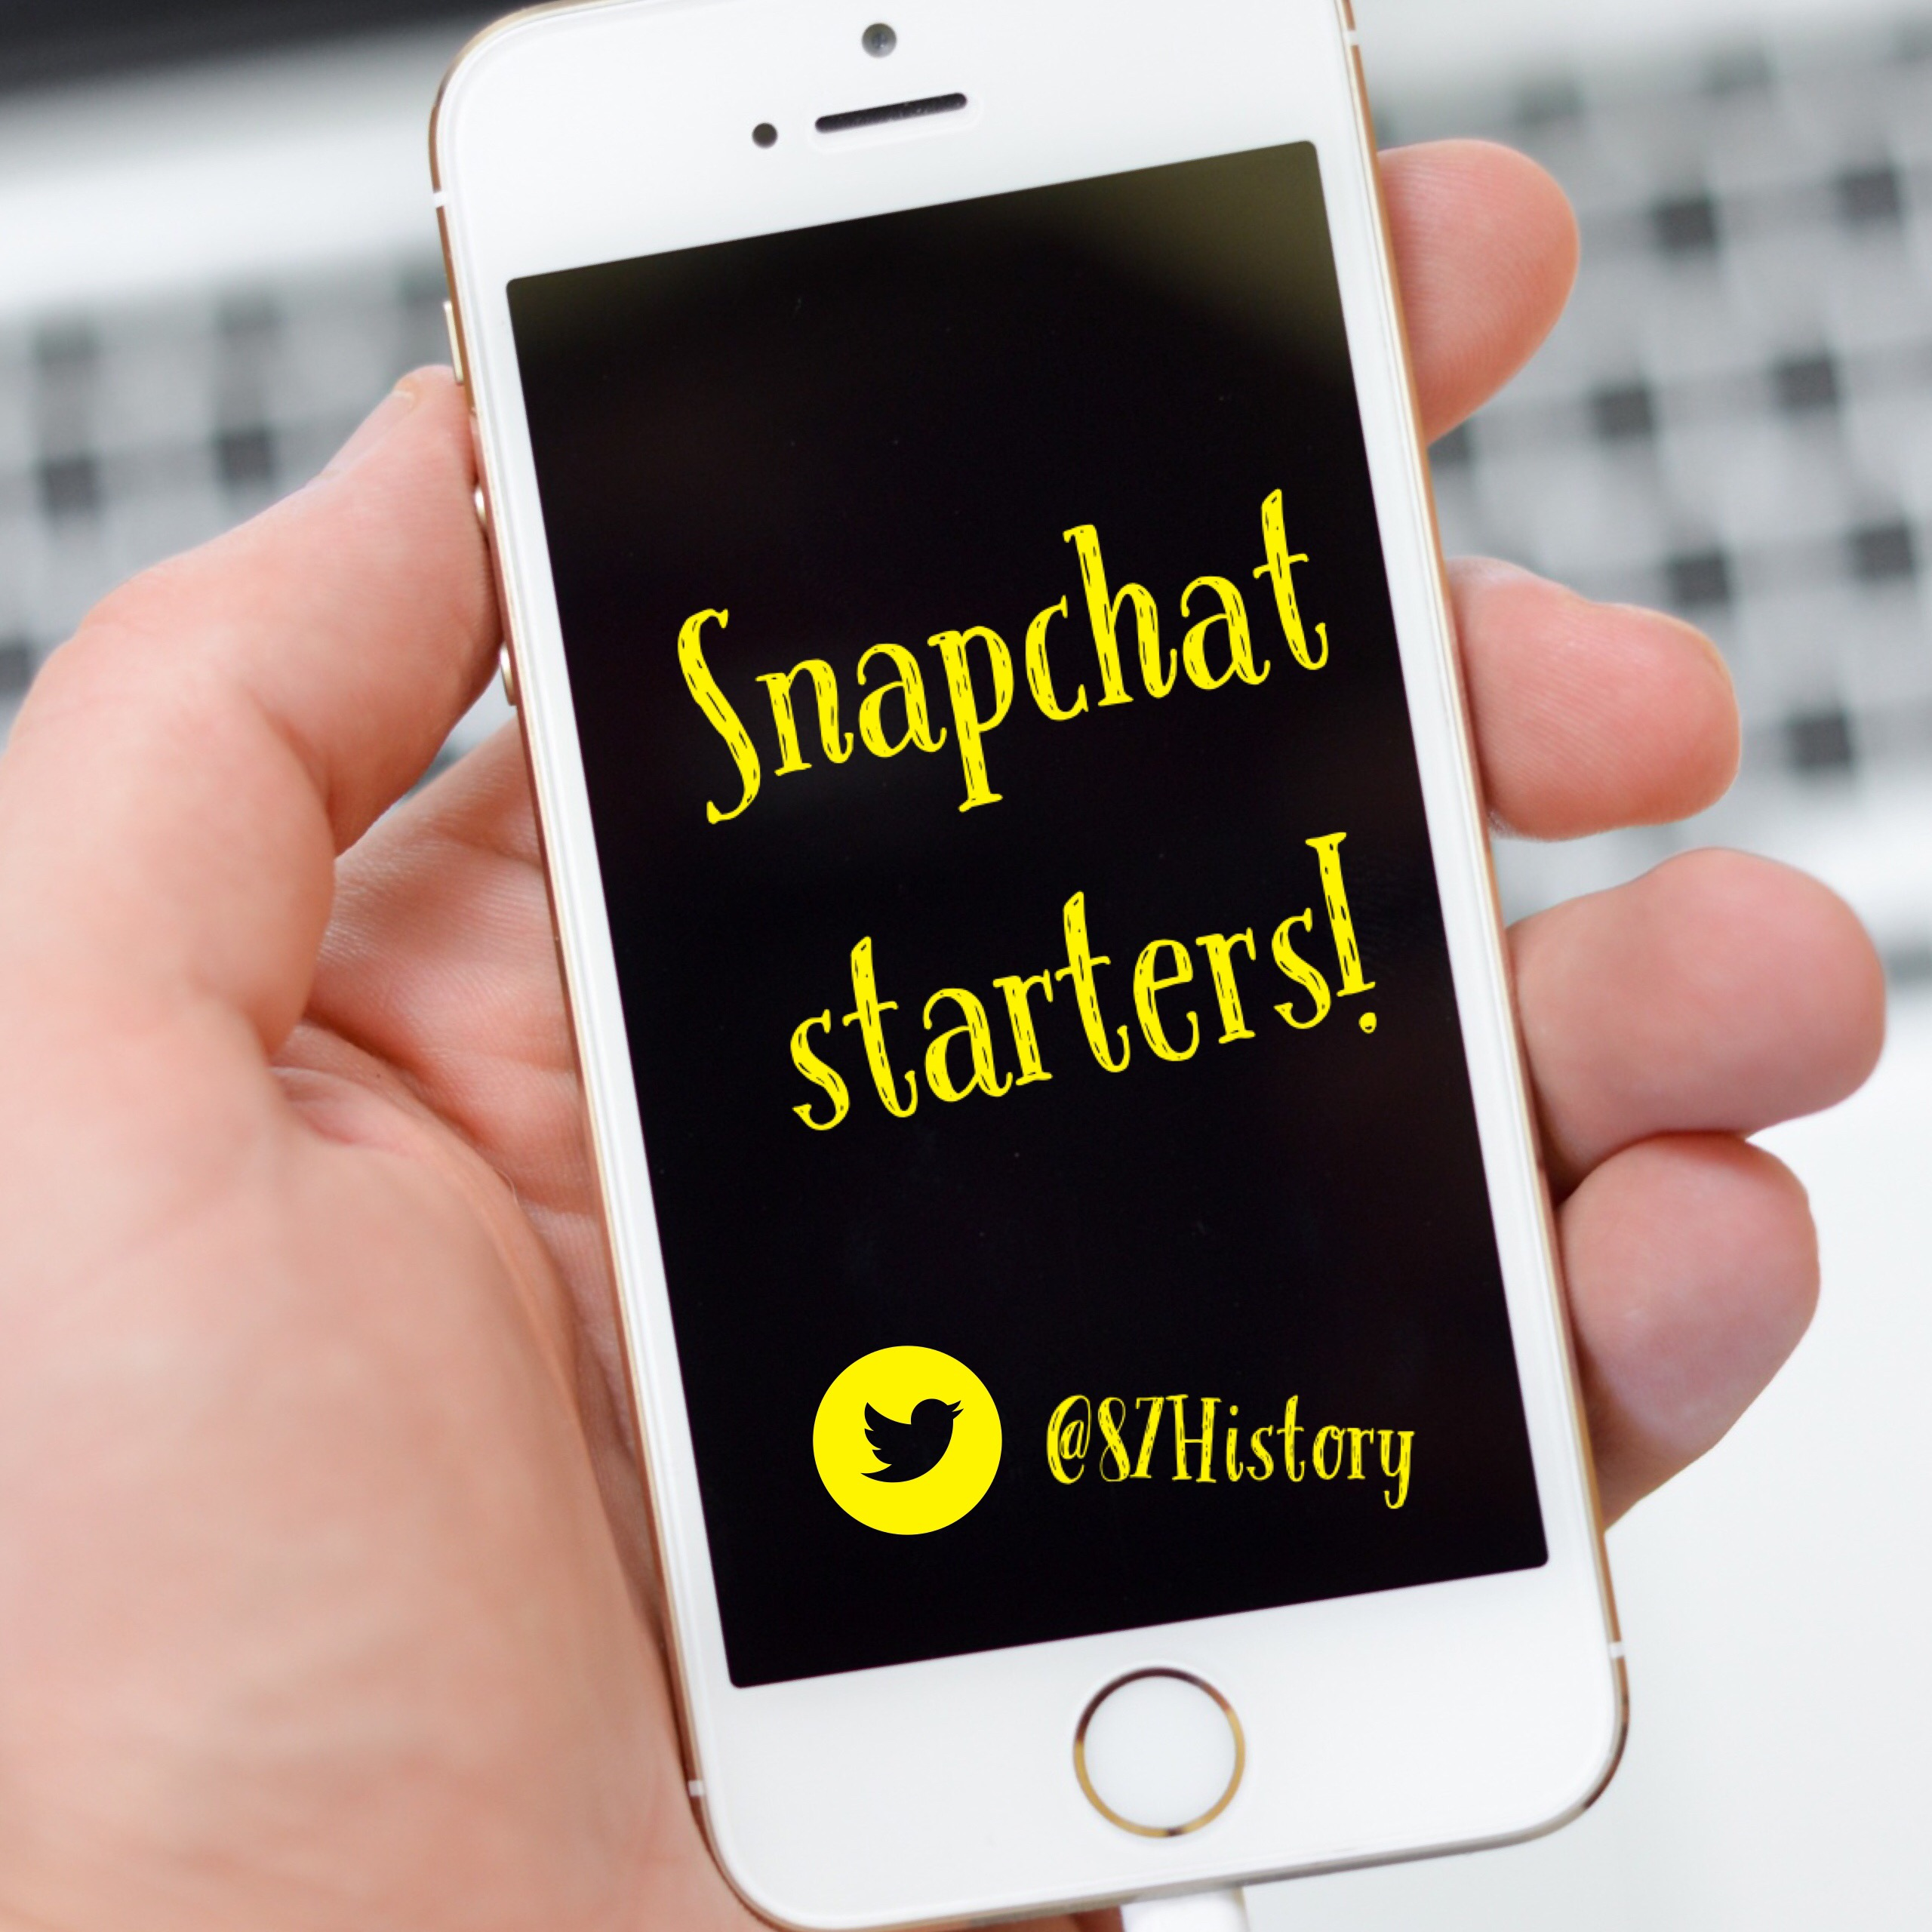 Snapchat starters…